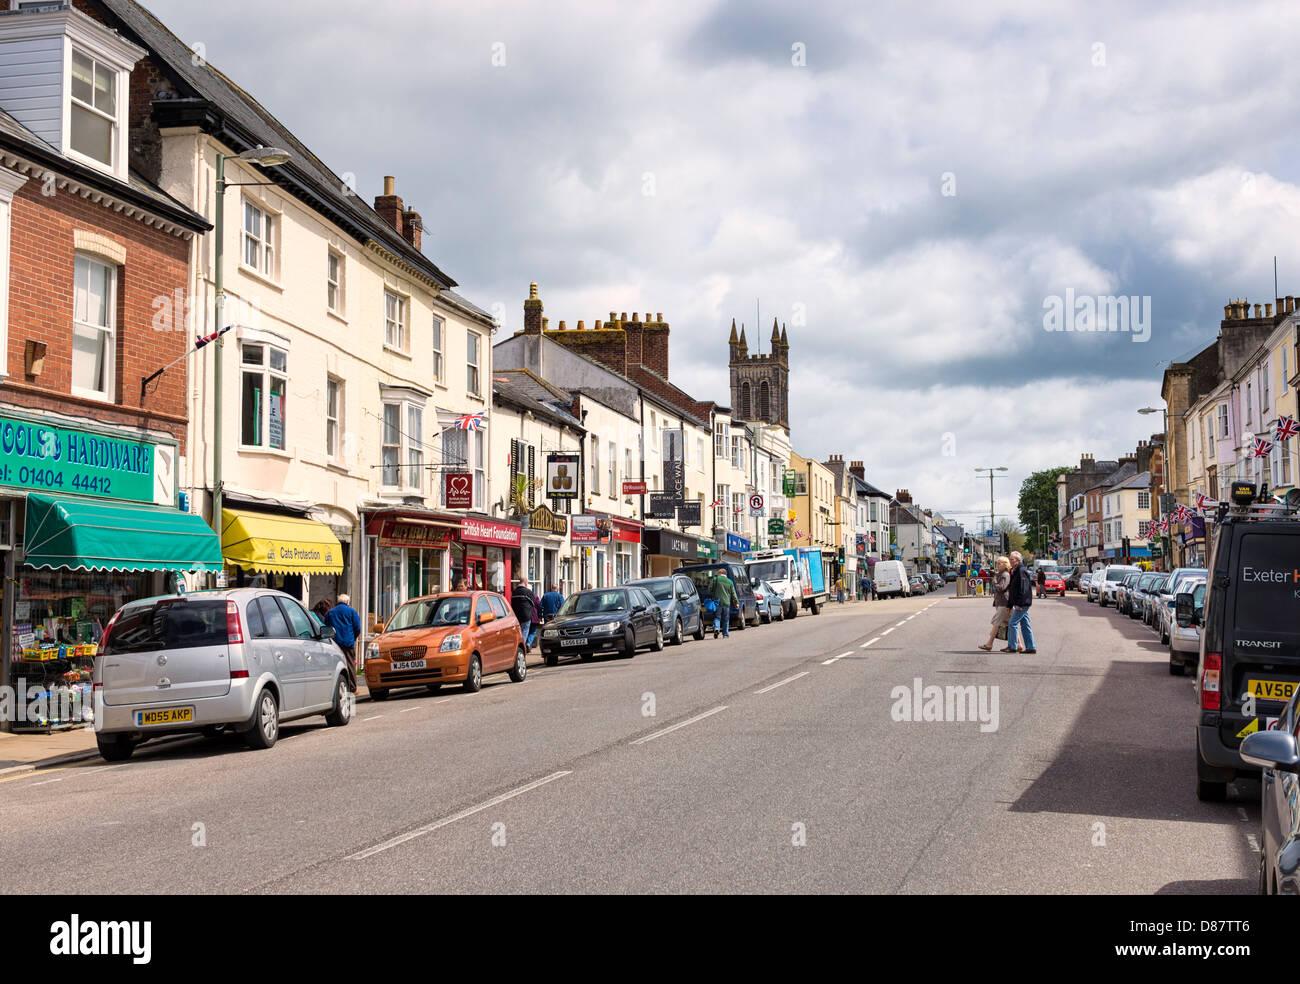 Honiton, Devon, England, UK - the town centre main high street Stock Photo